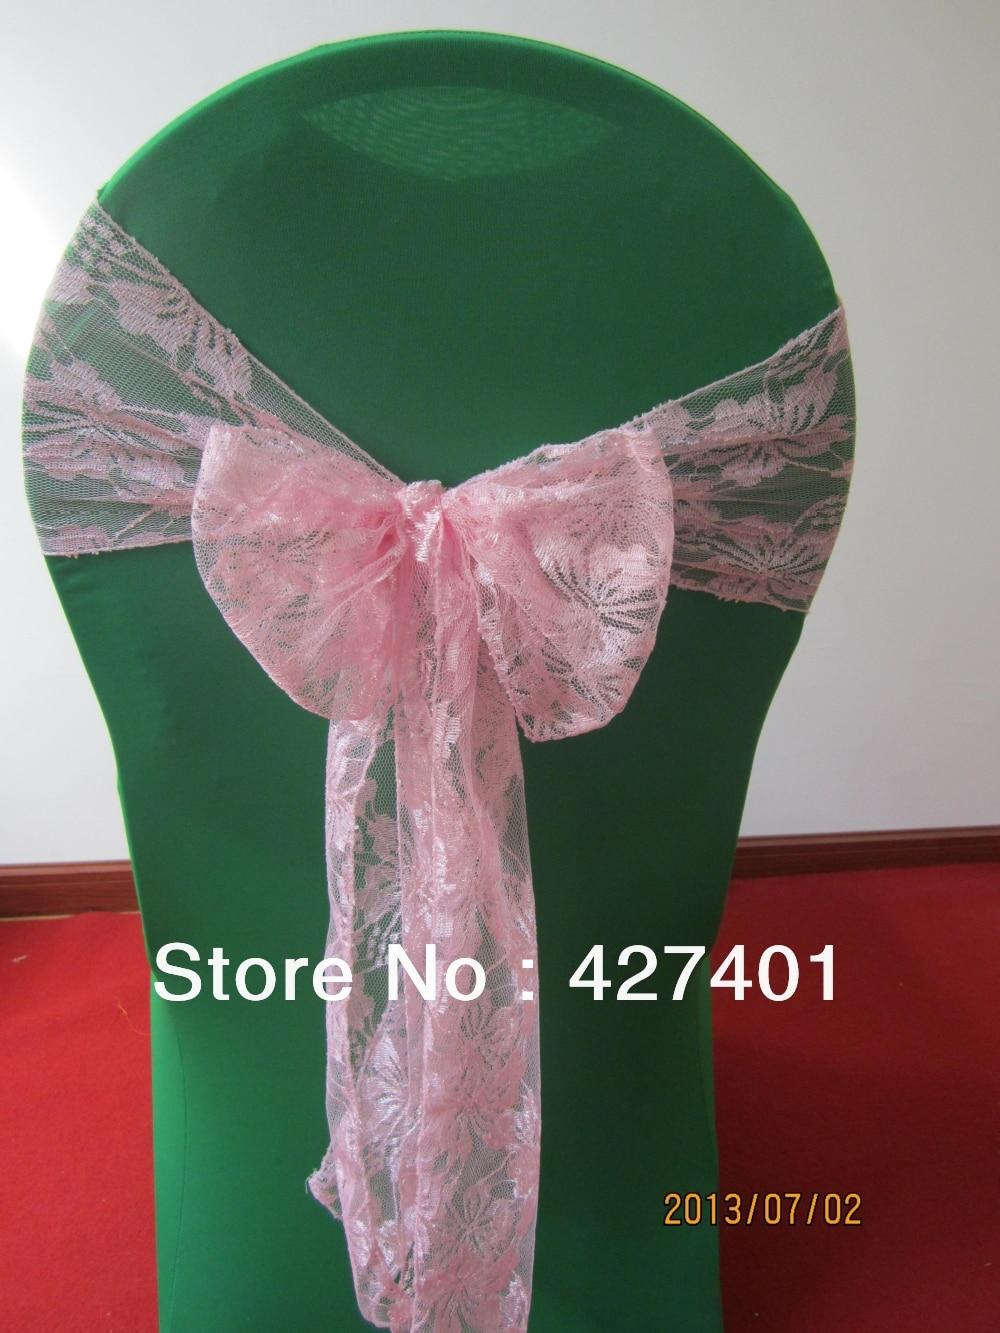 ✅Venta caliente Rosa Encaje silla para Fundas para Sillas   a678